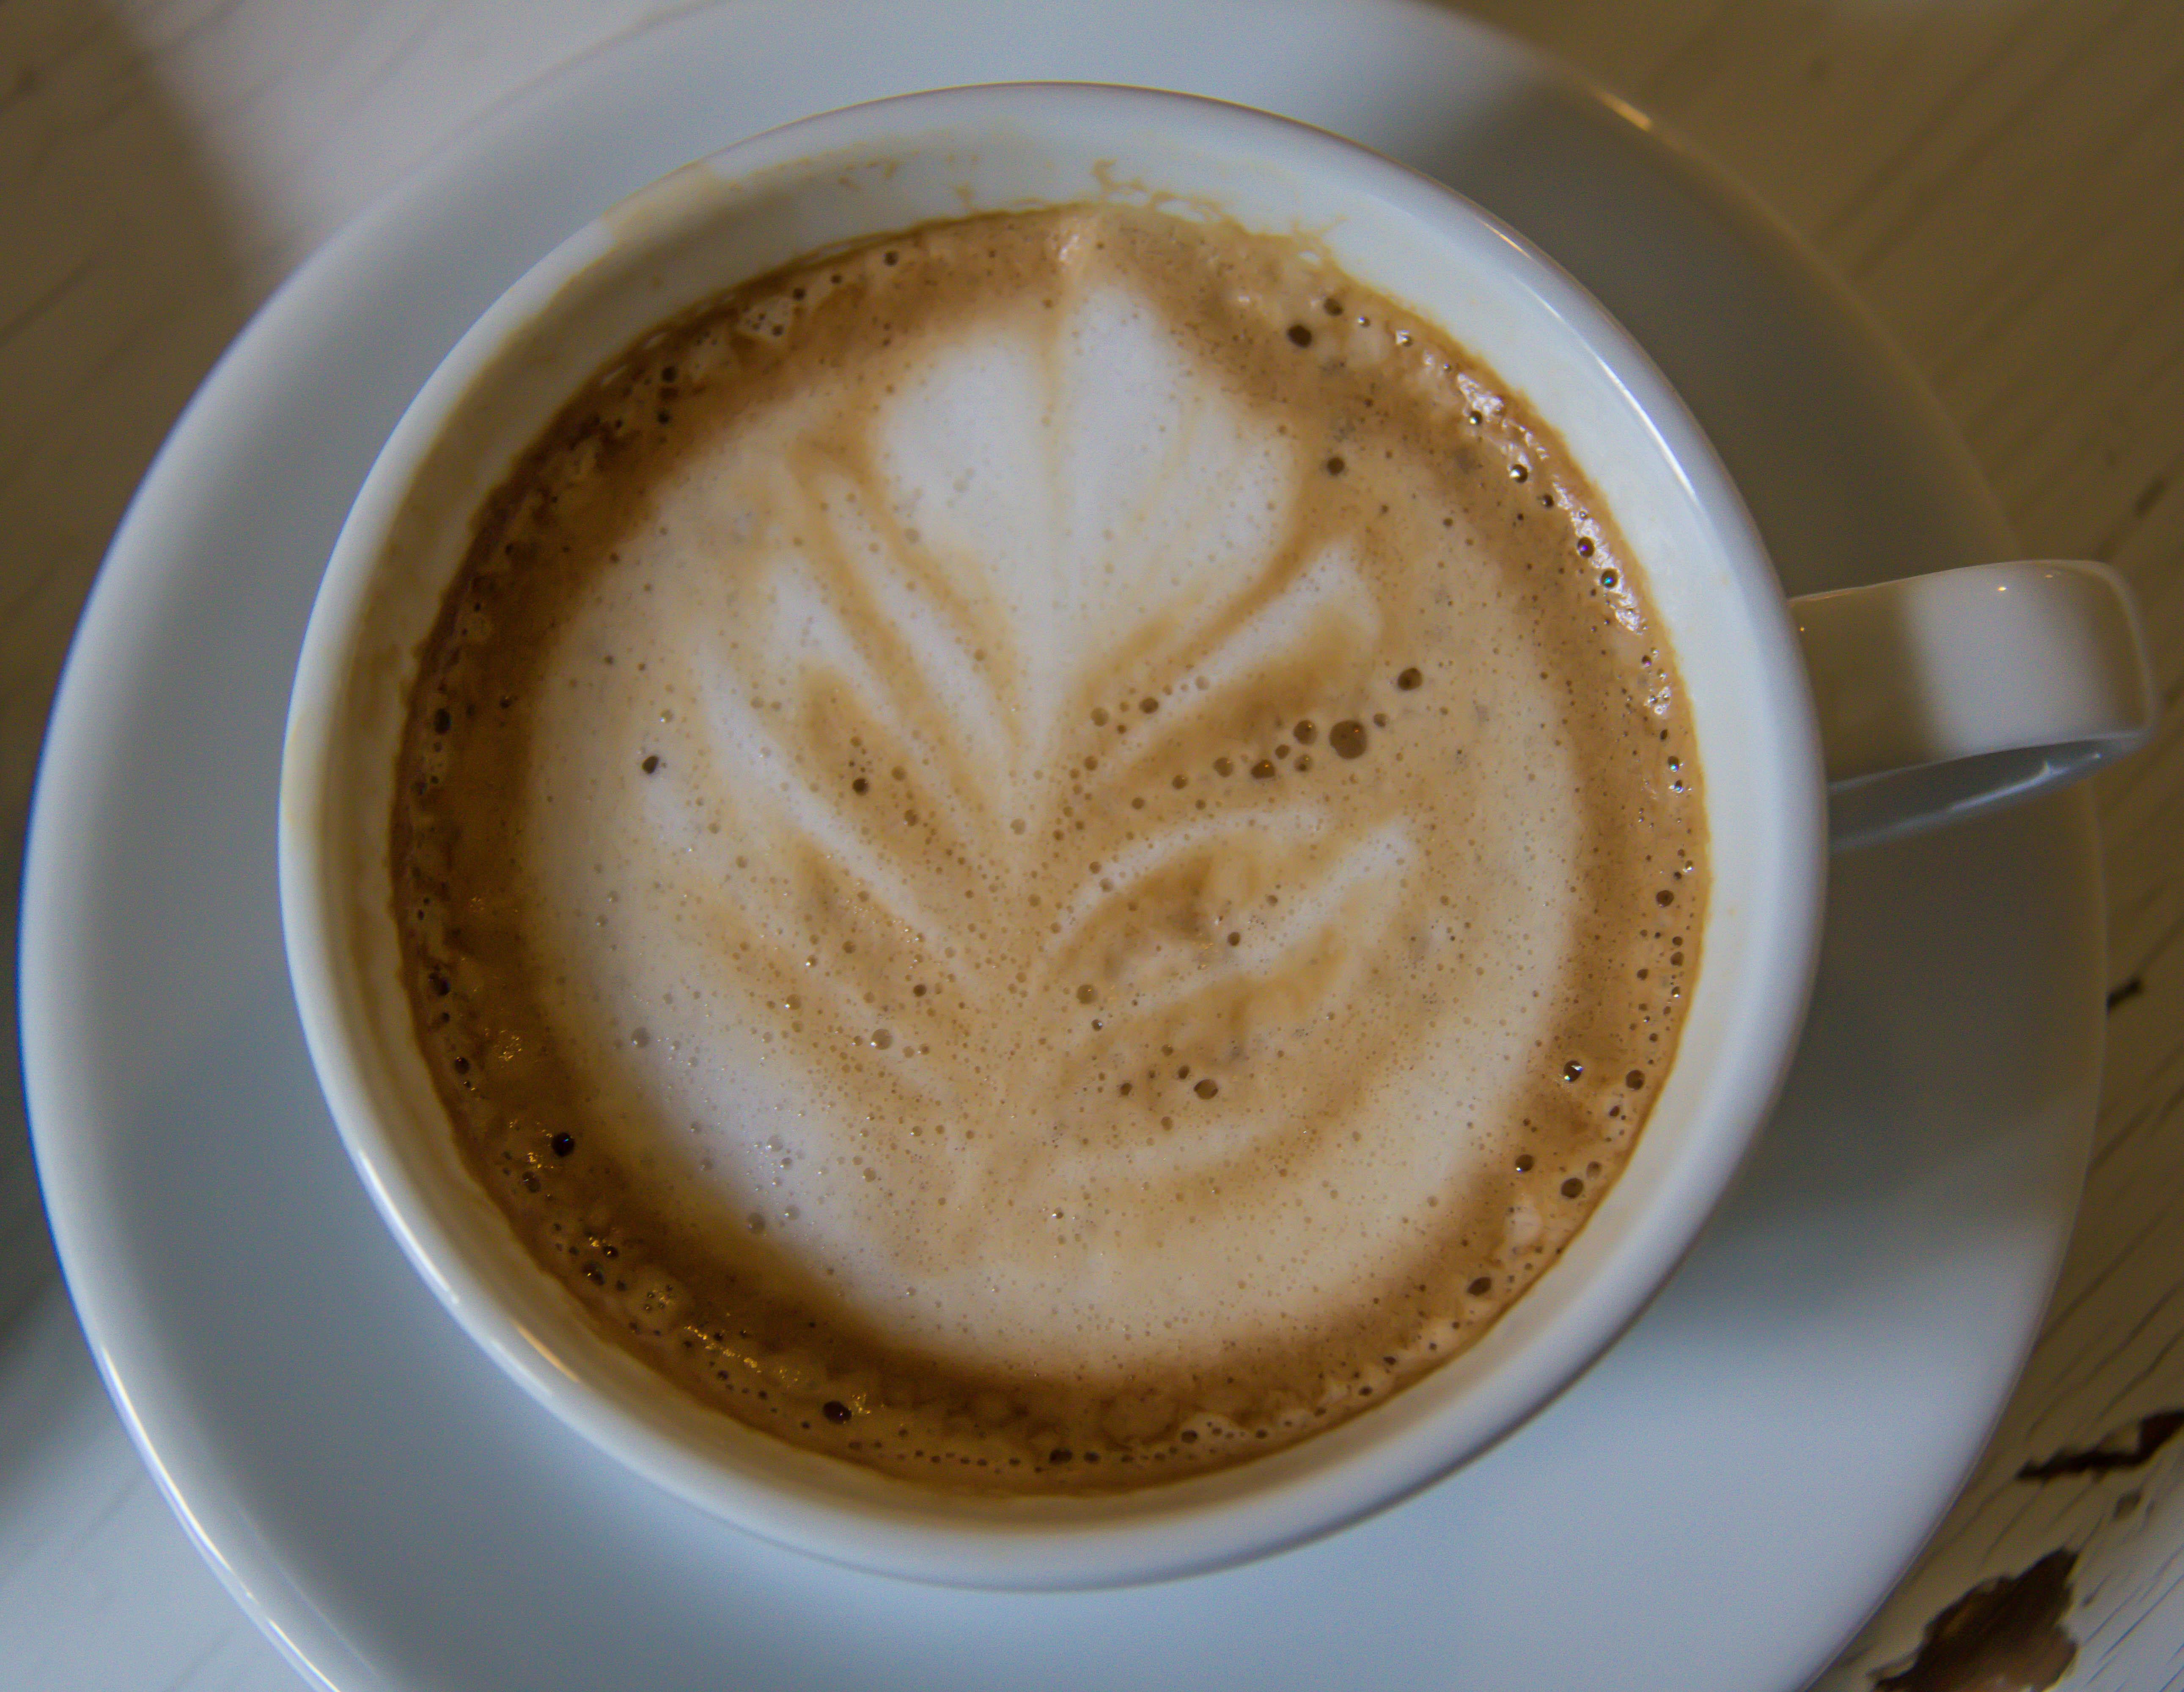 Hintergrundbilder : Getränk, Tasse, Latté, Cappuccino, Koffein ...